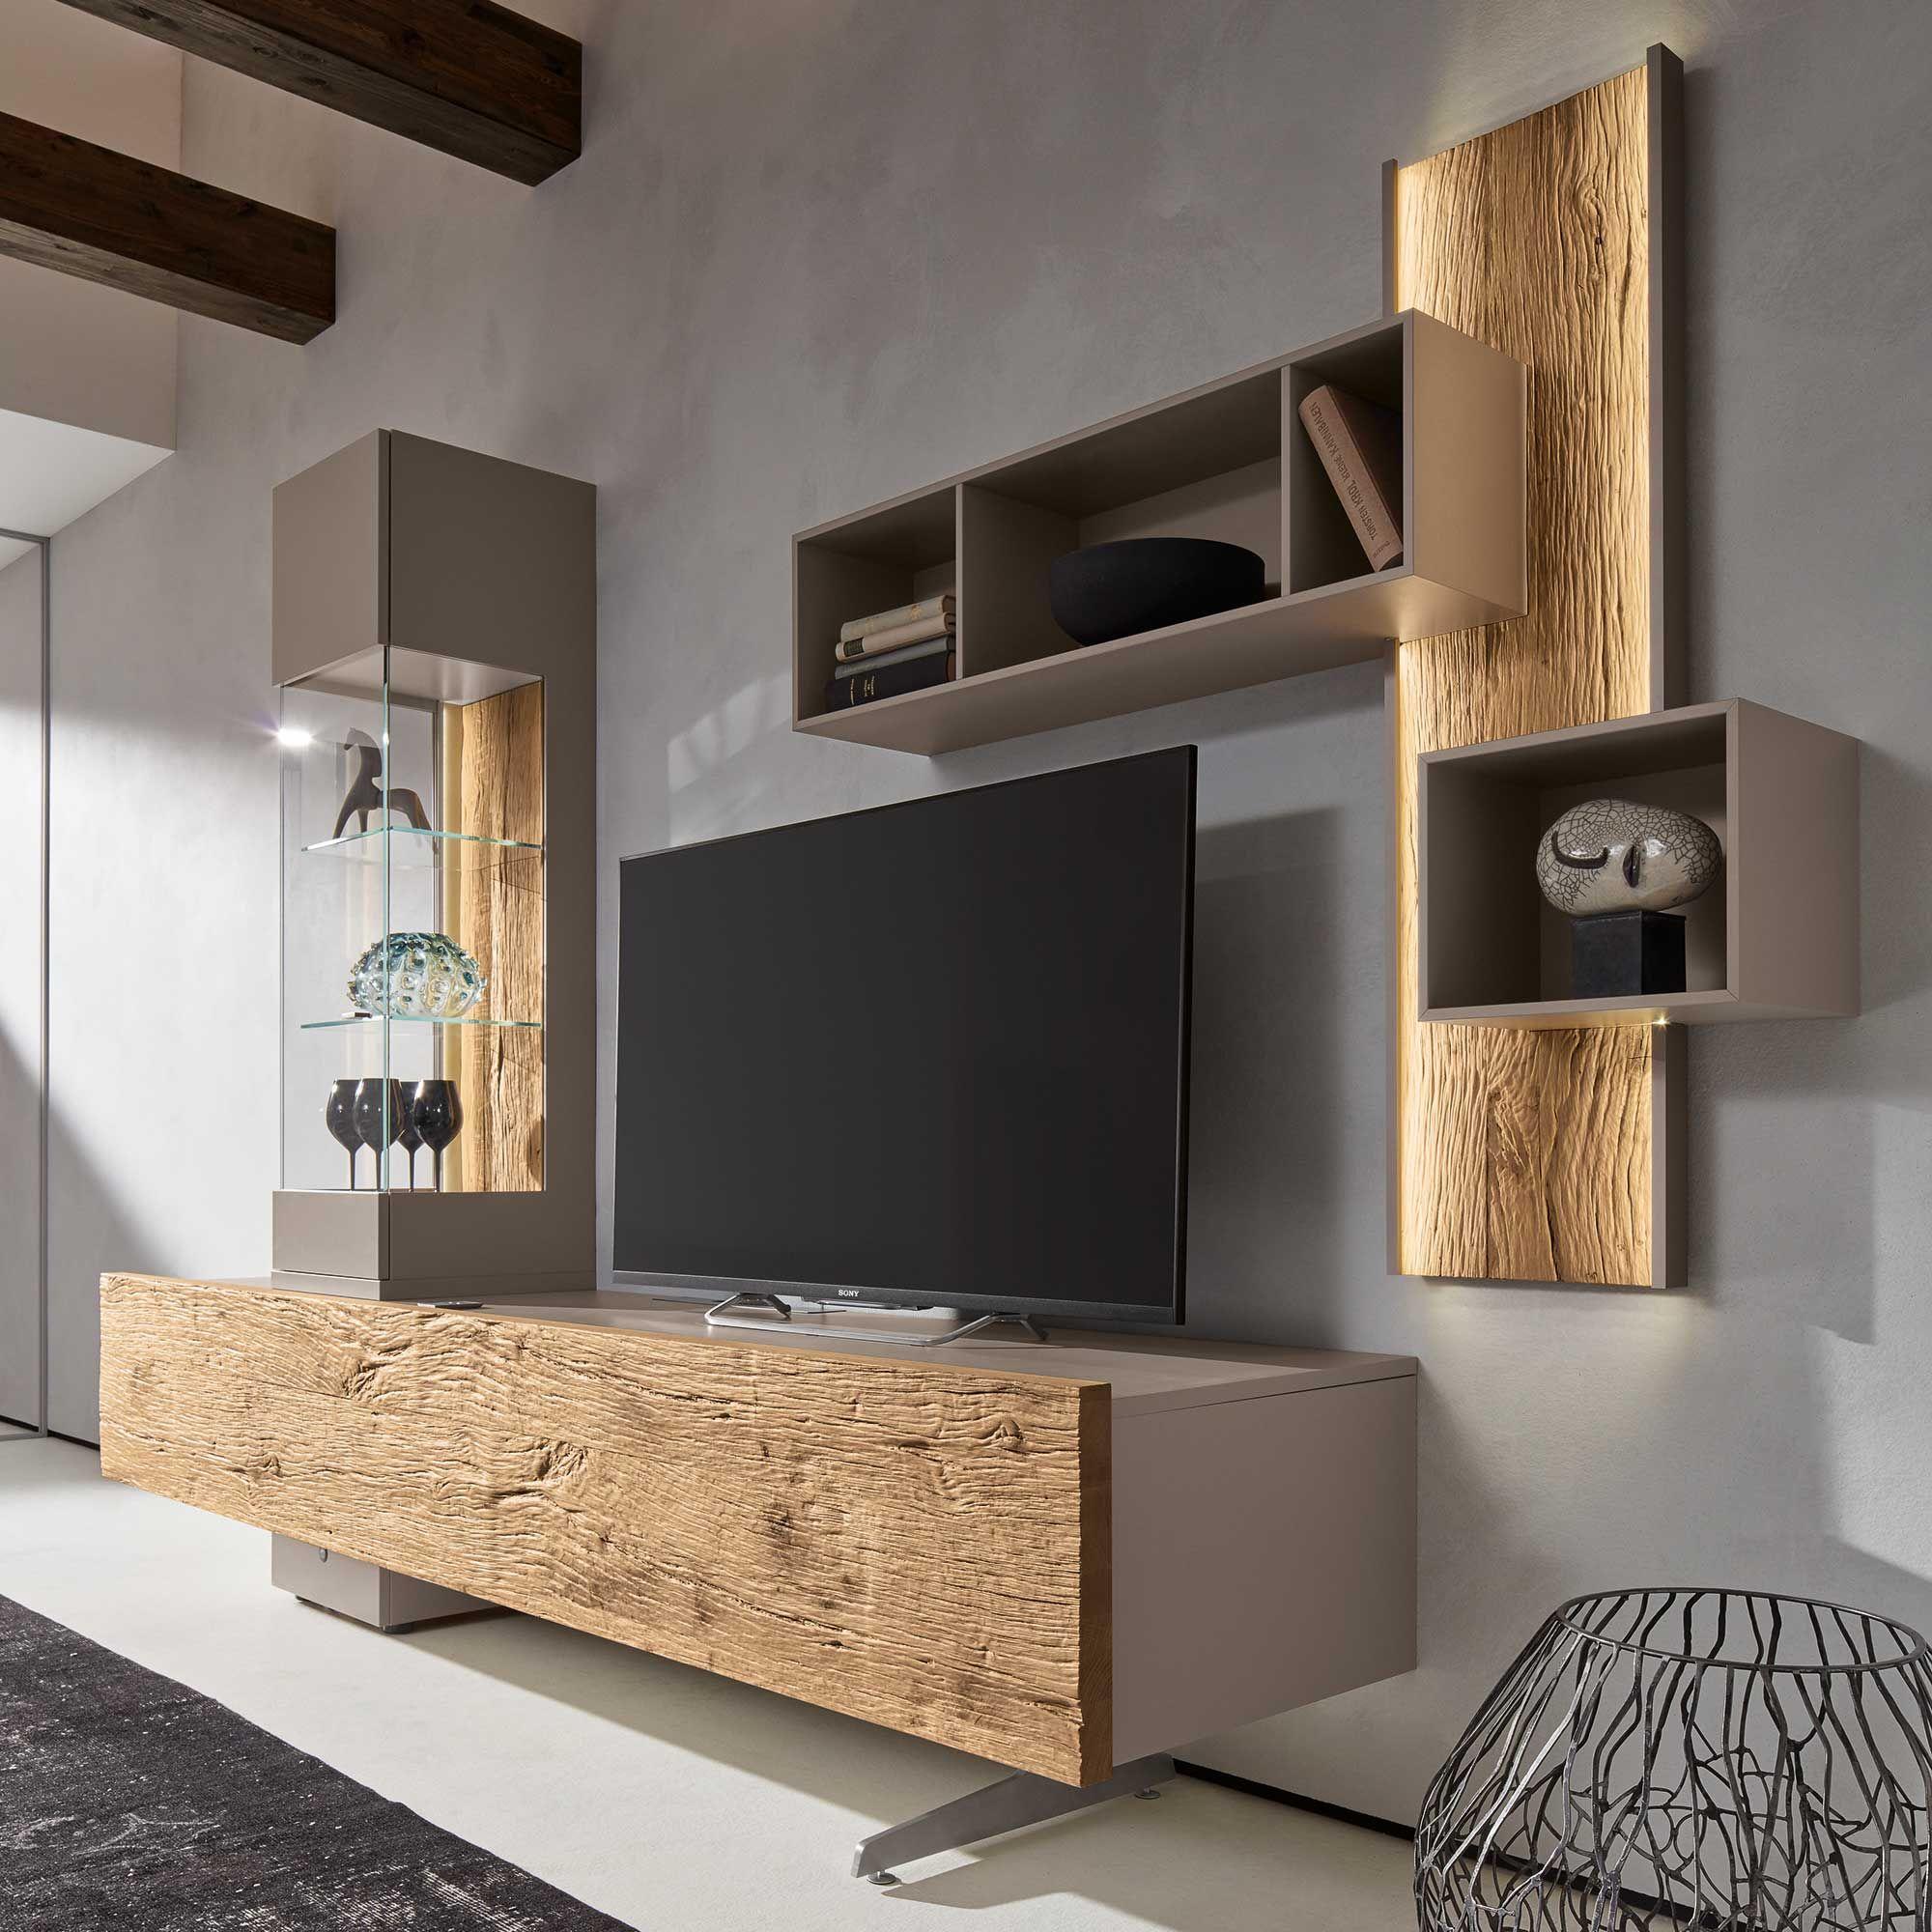 Pin By Baloghn Liplin On Nappali Pinterest Tv Unit Tvs And  # Meuble Tv Carlo